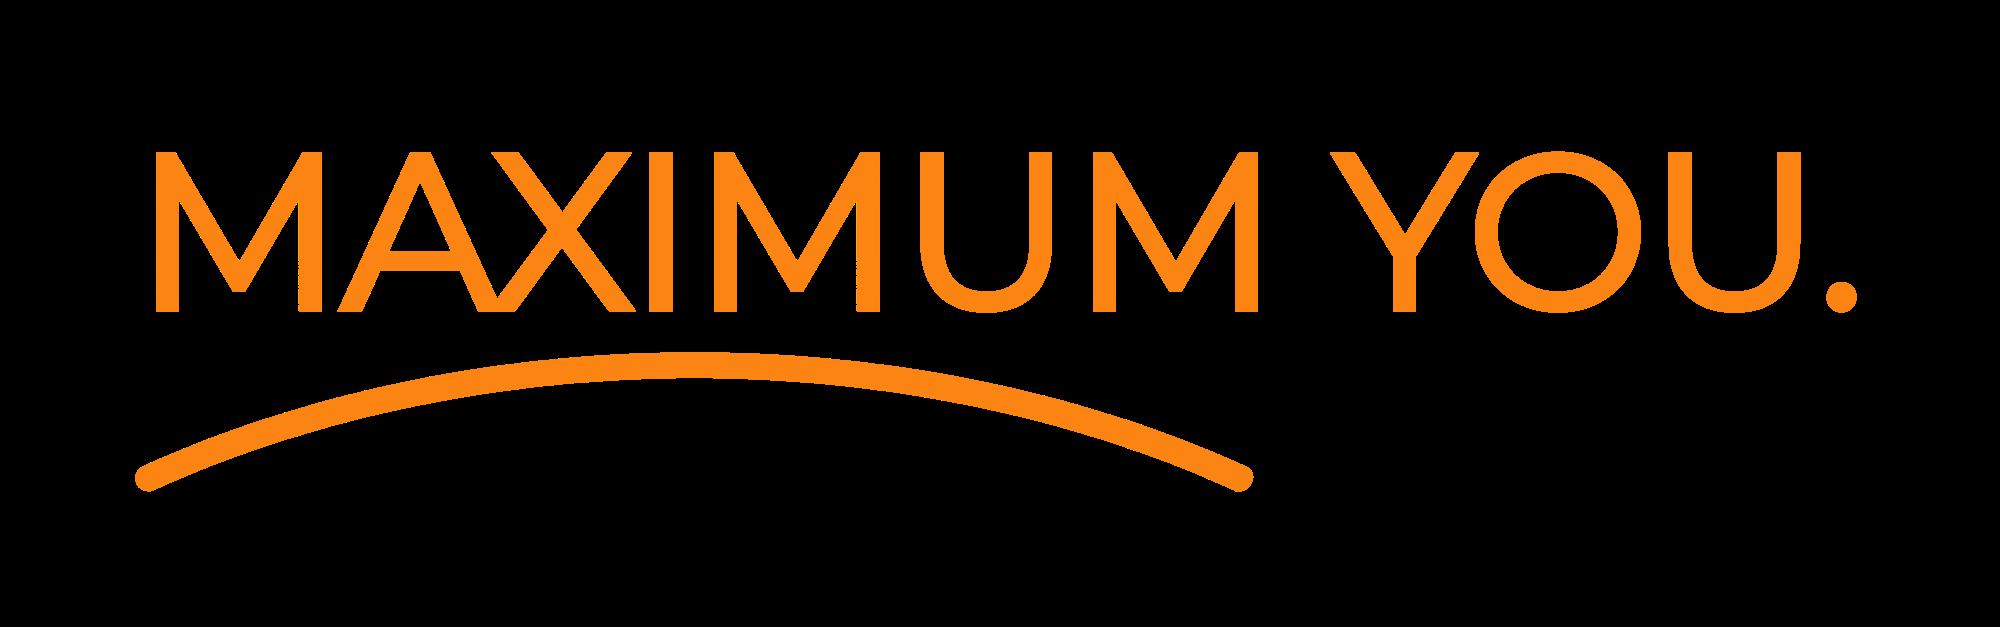 MAXIMUM YOU.-logo.png